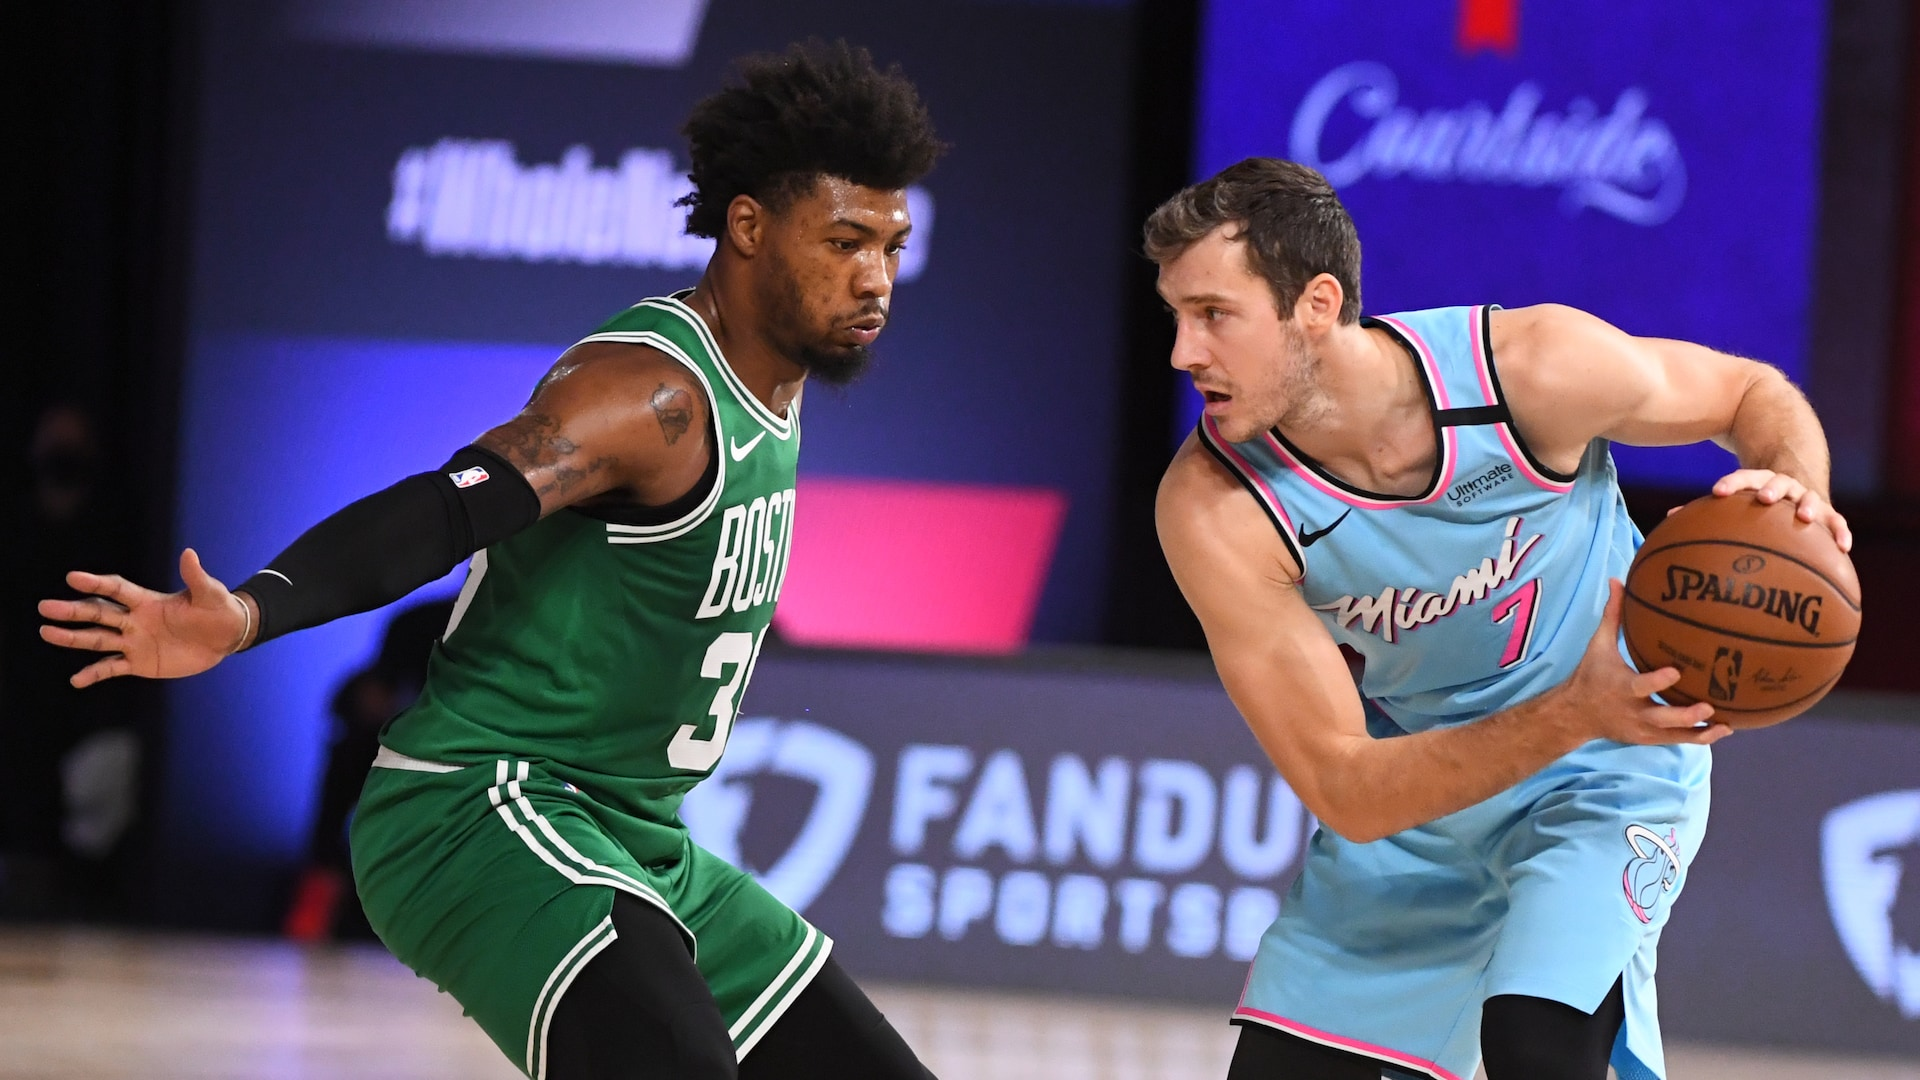 Series Preview: Can Miami's tenacity stop Boston's talent?